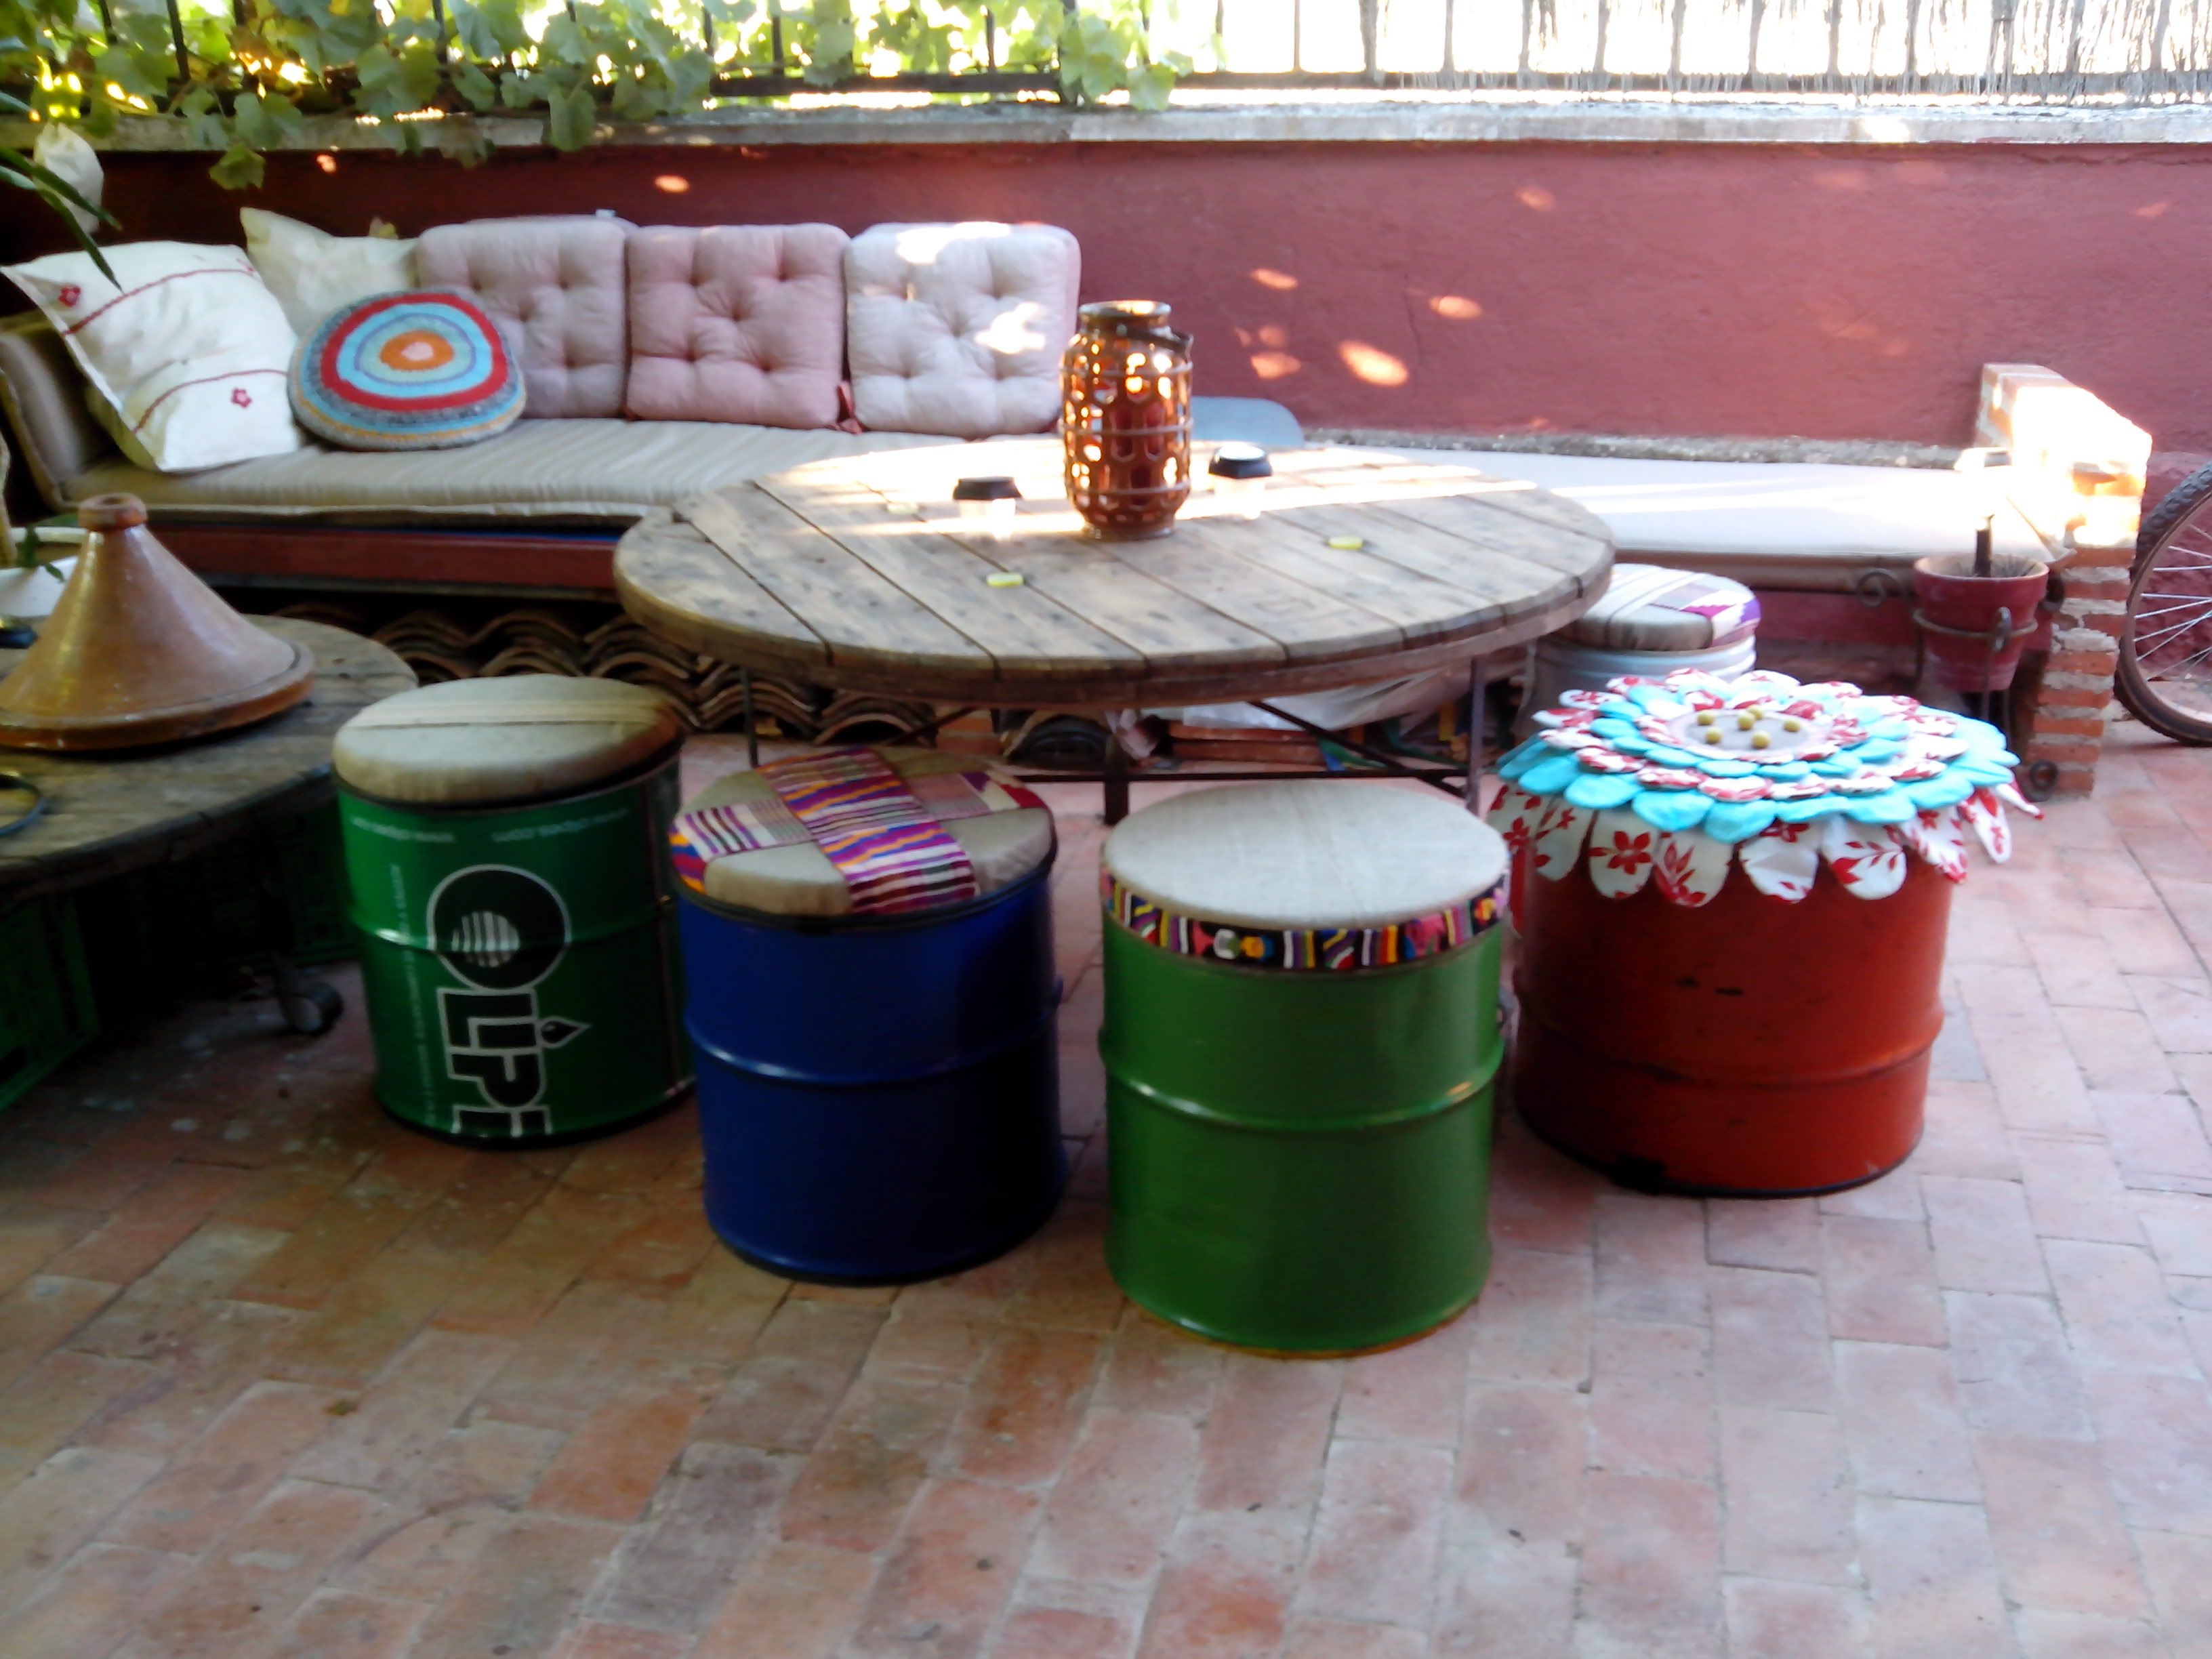 Taburetes Bidones Chillout Pinterest Banquetas Caj Nes Y  # Muebles Bidones